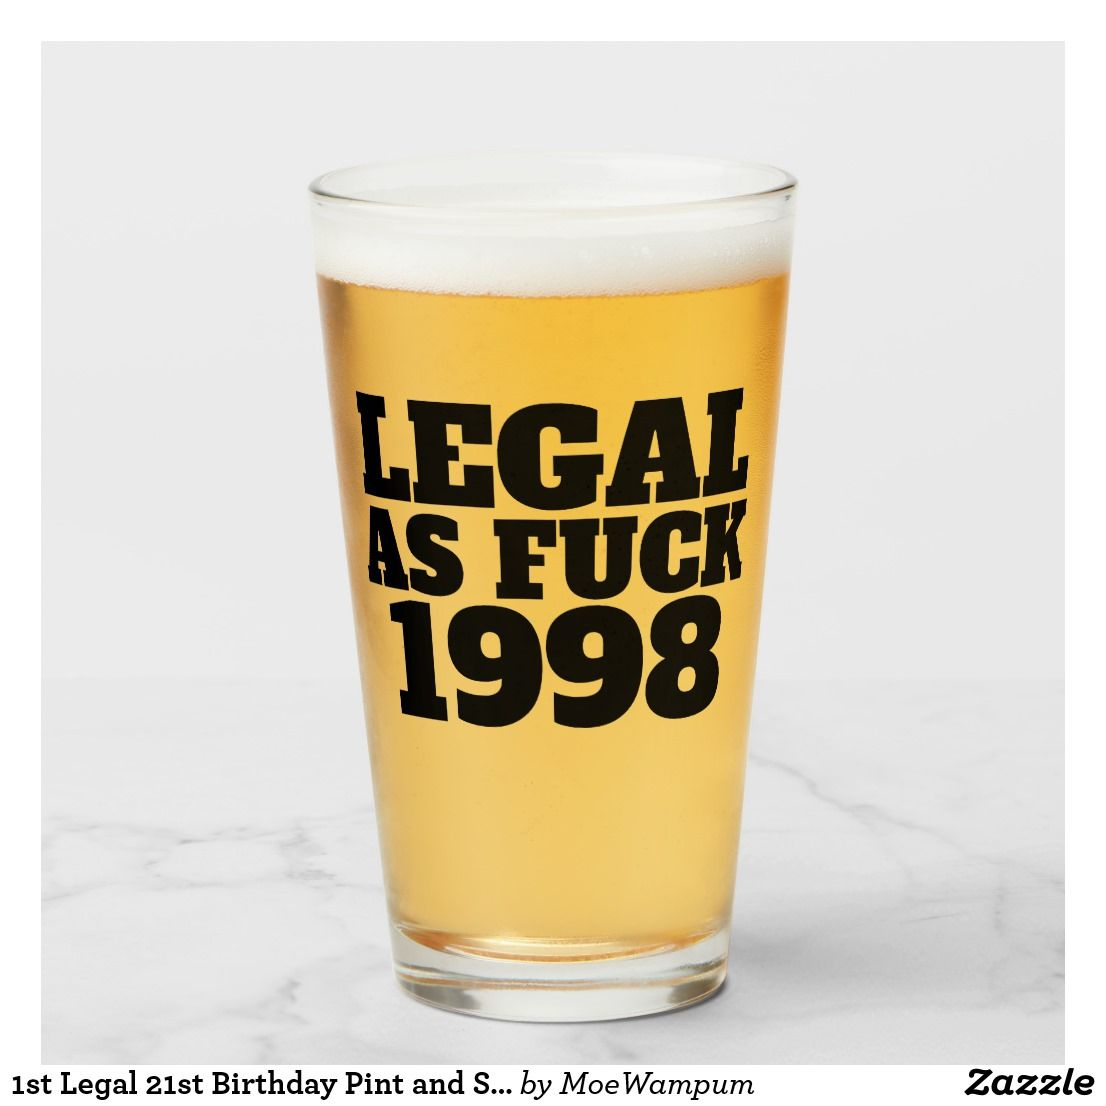 1st legal 21st birthday pint and shot glass set tumbler